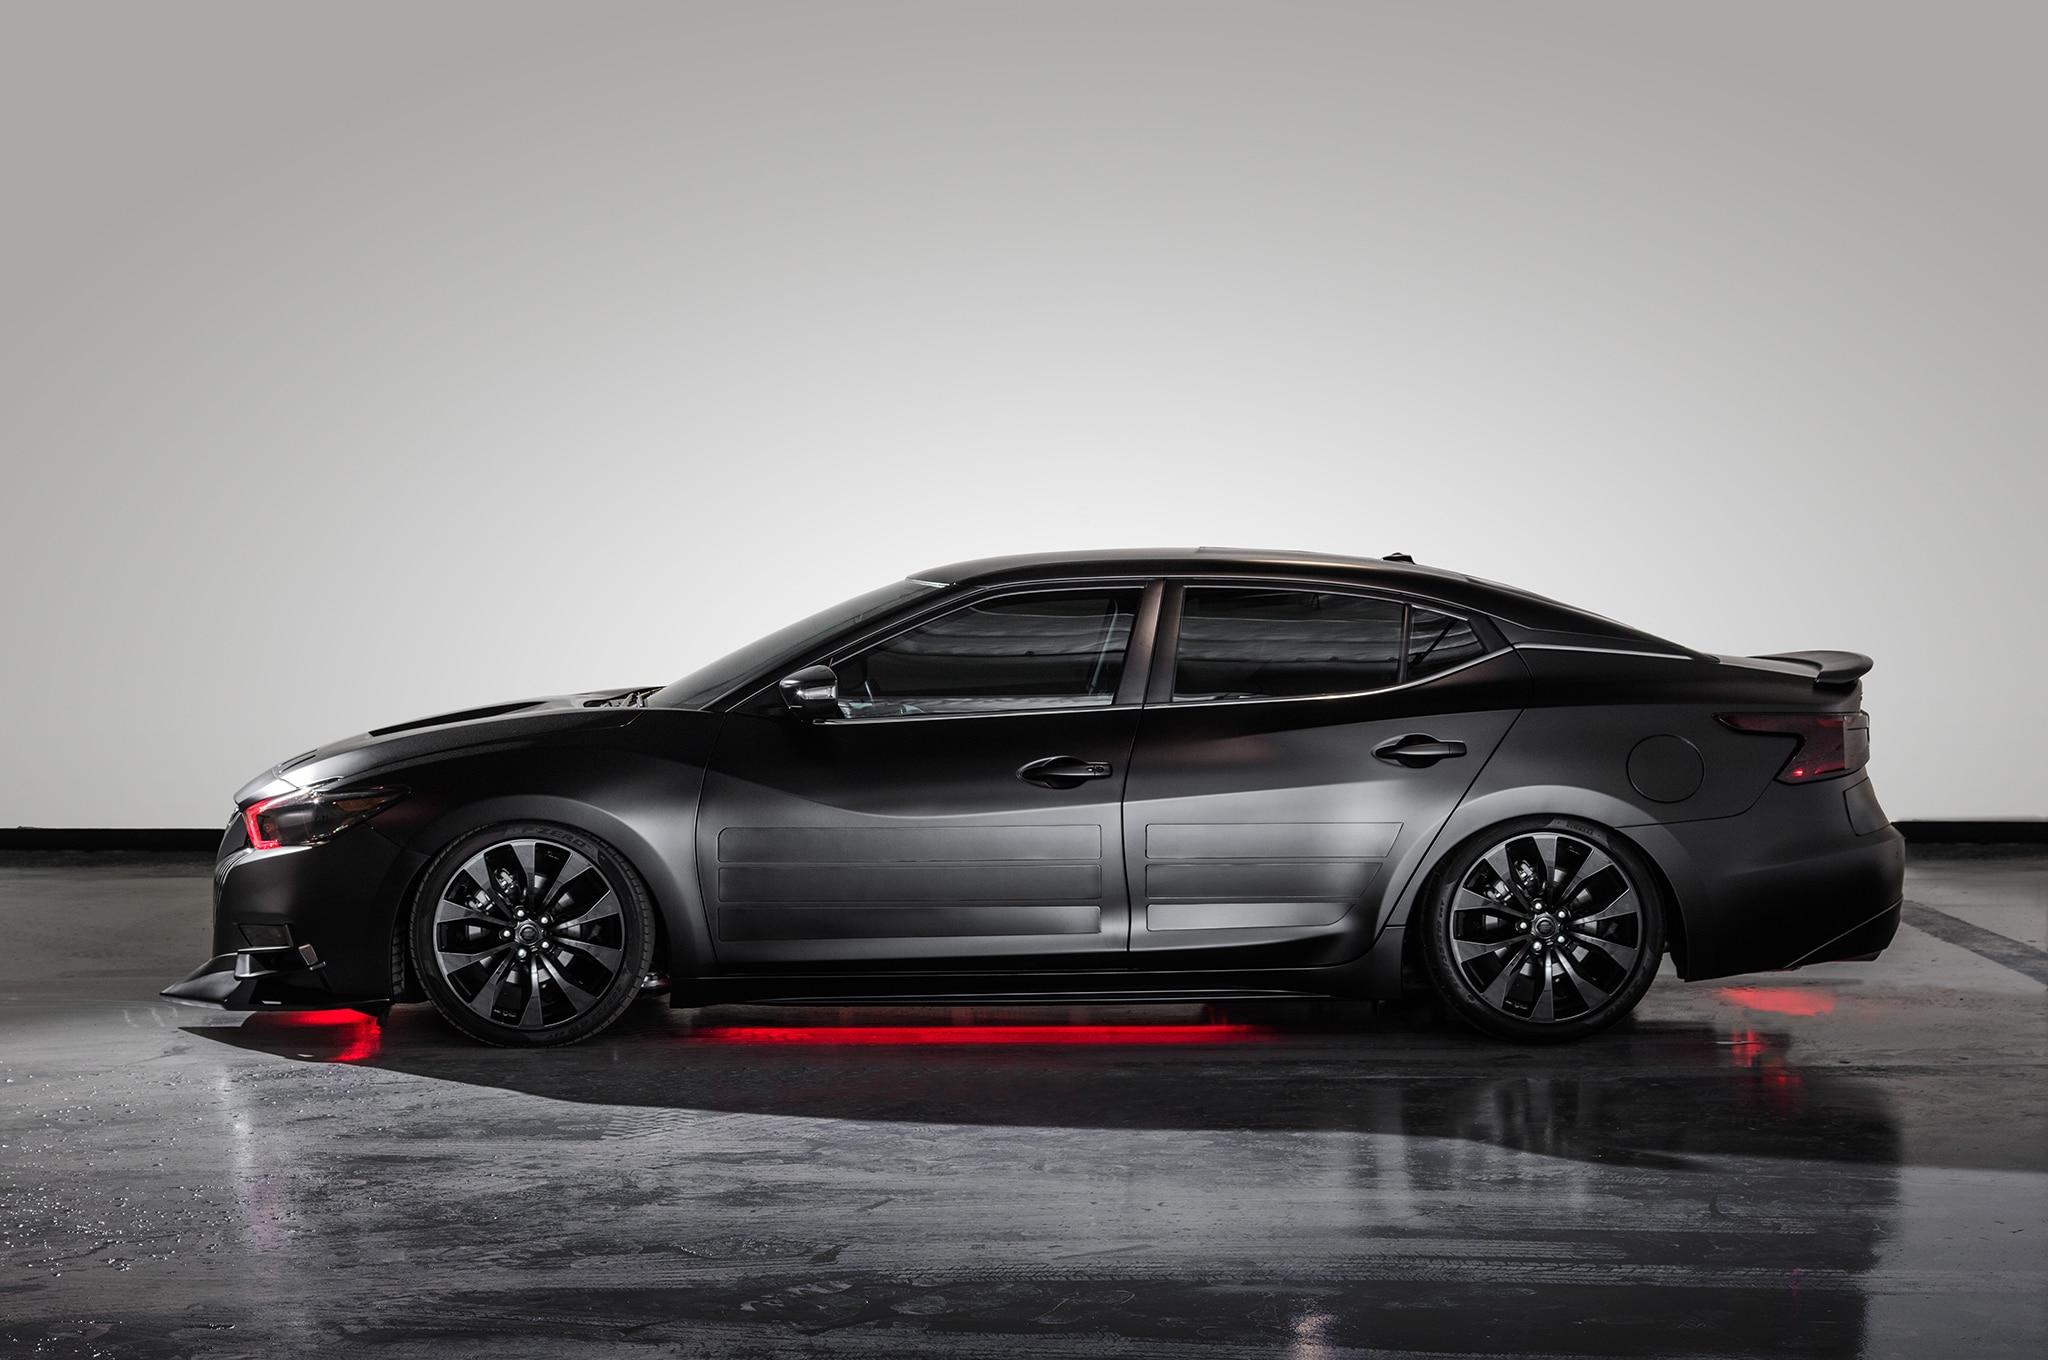 2018 Nissan Maxima Show Car Kylo Ren Side